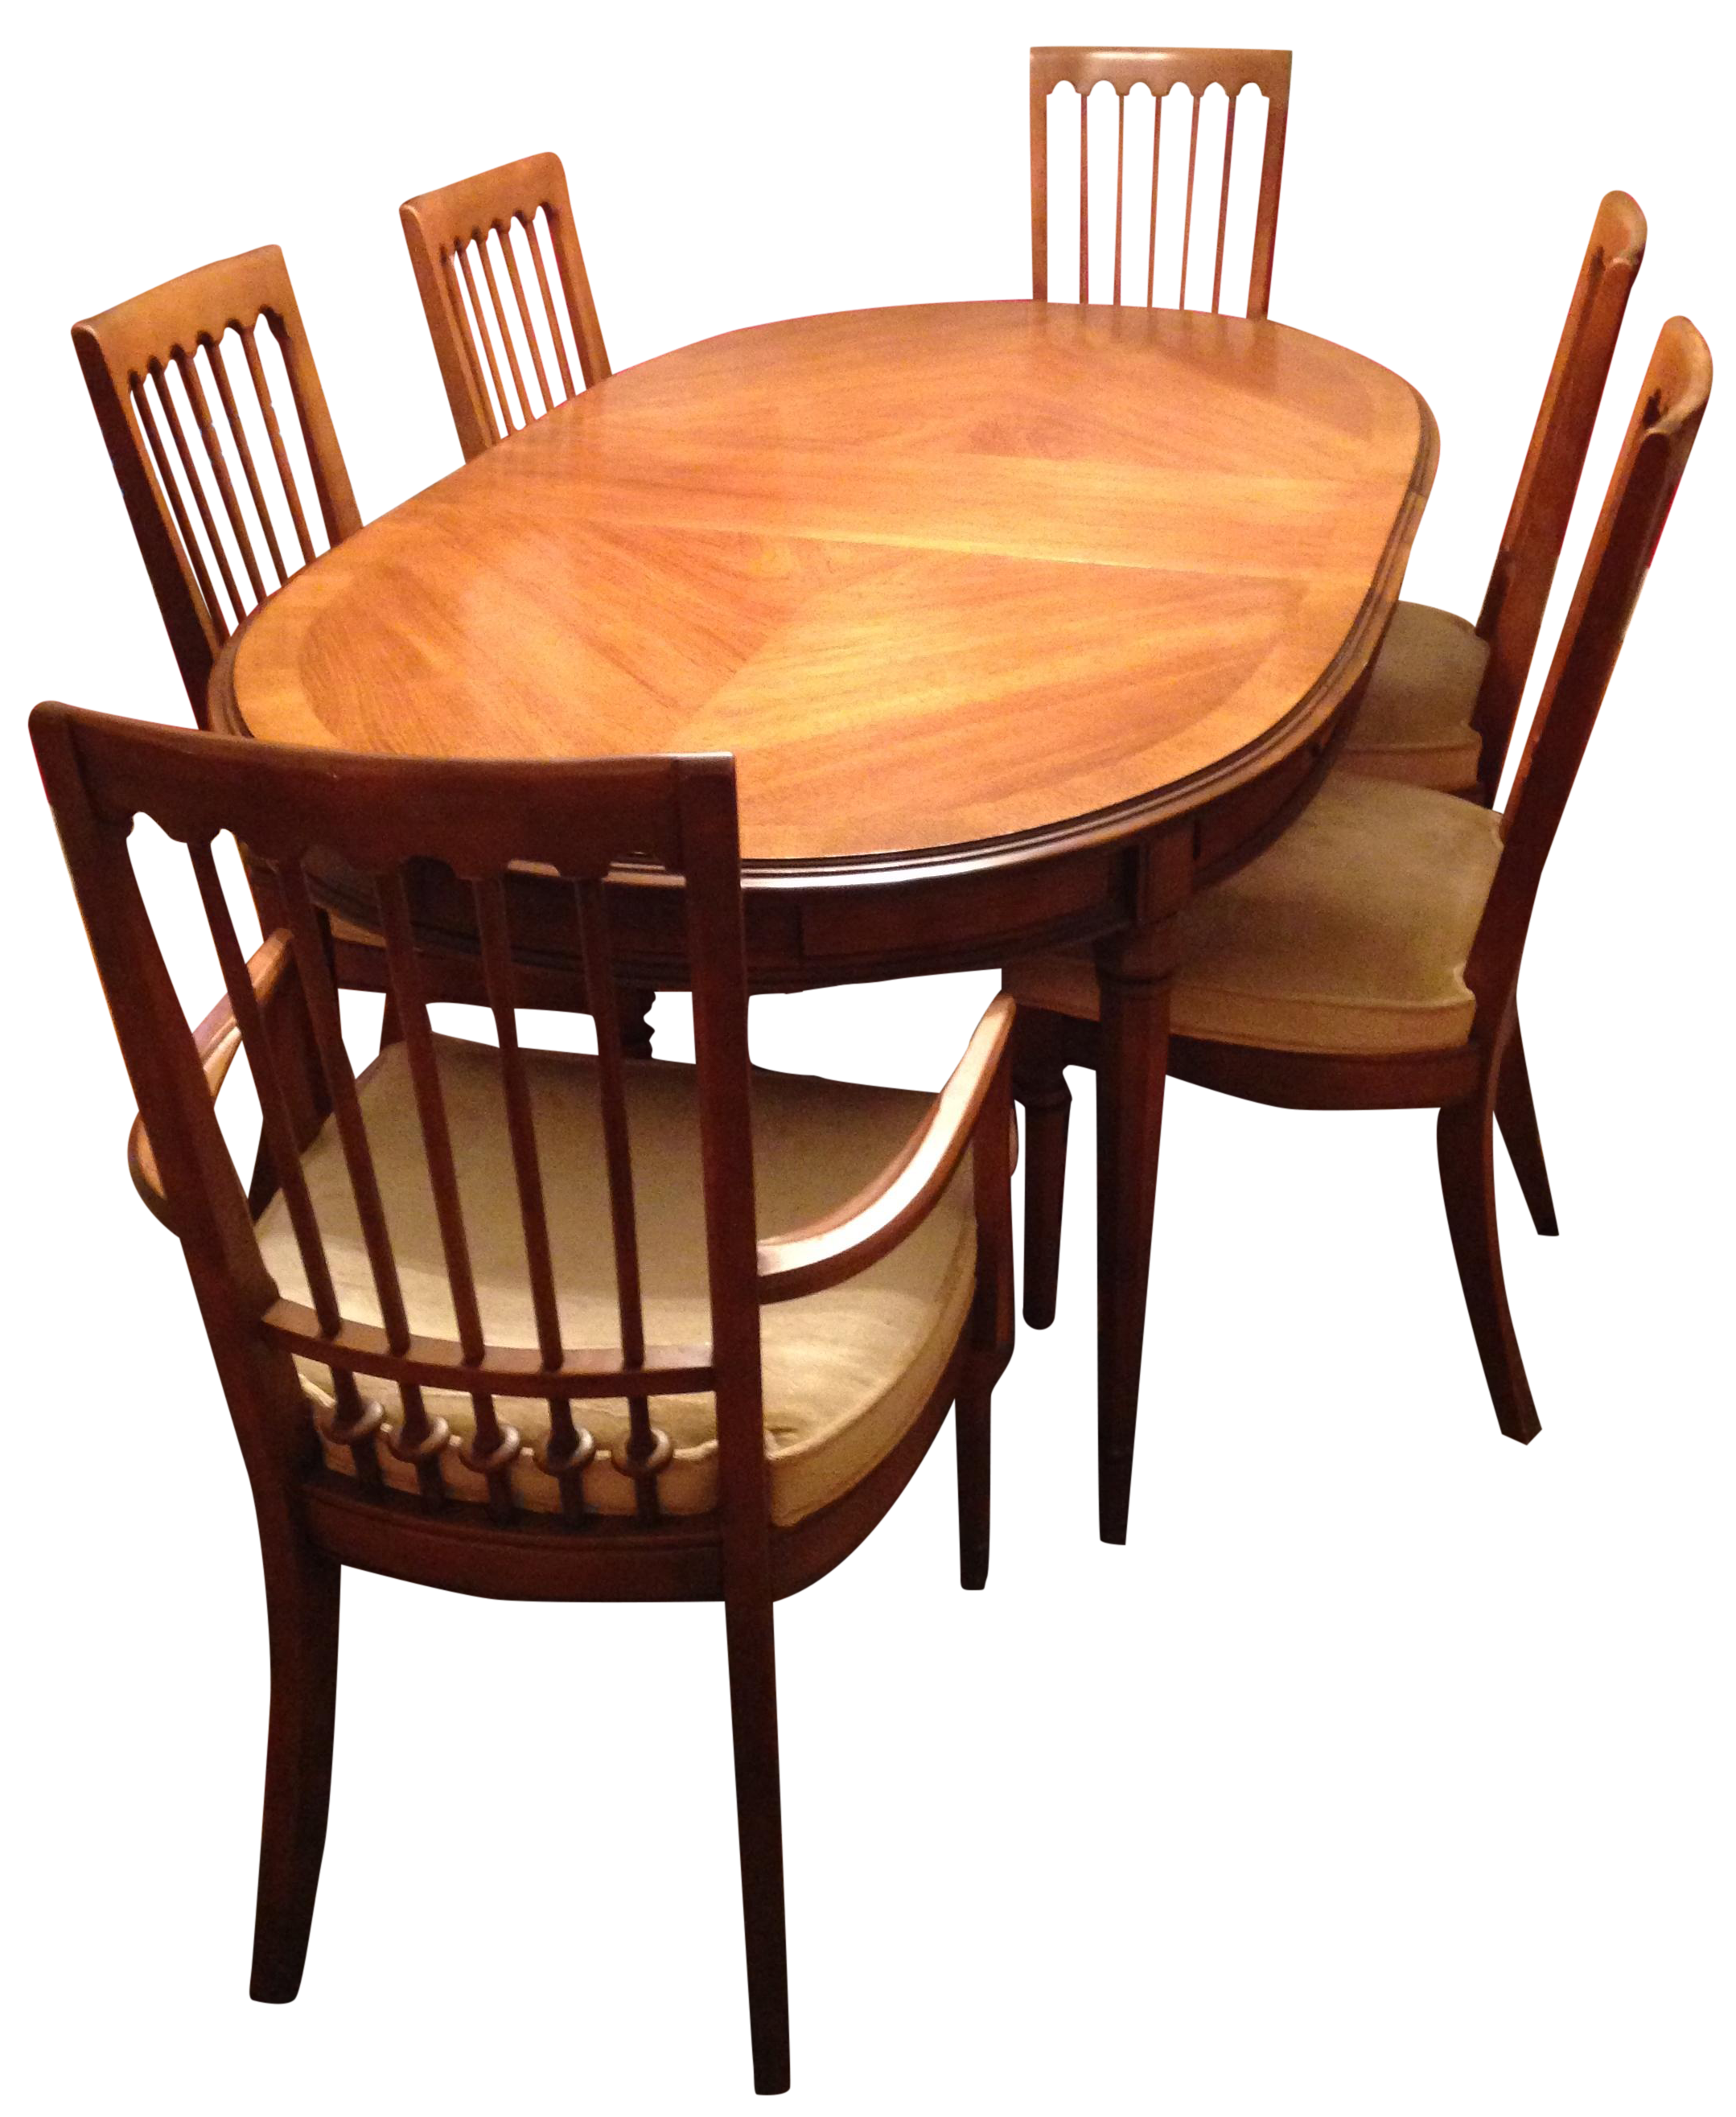 drexel esperanto dining set chairish